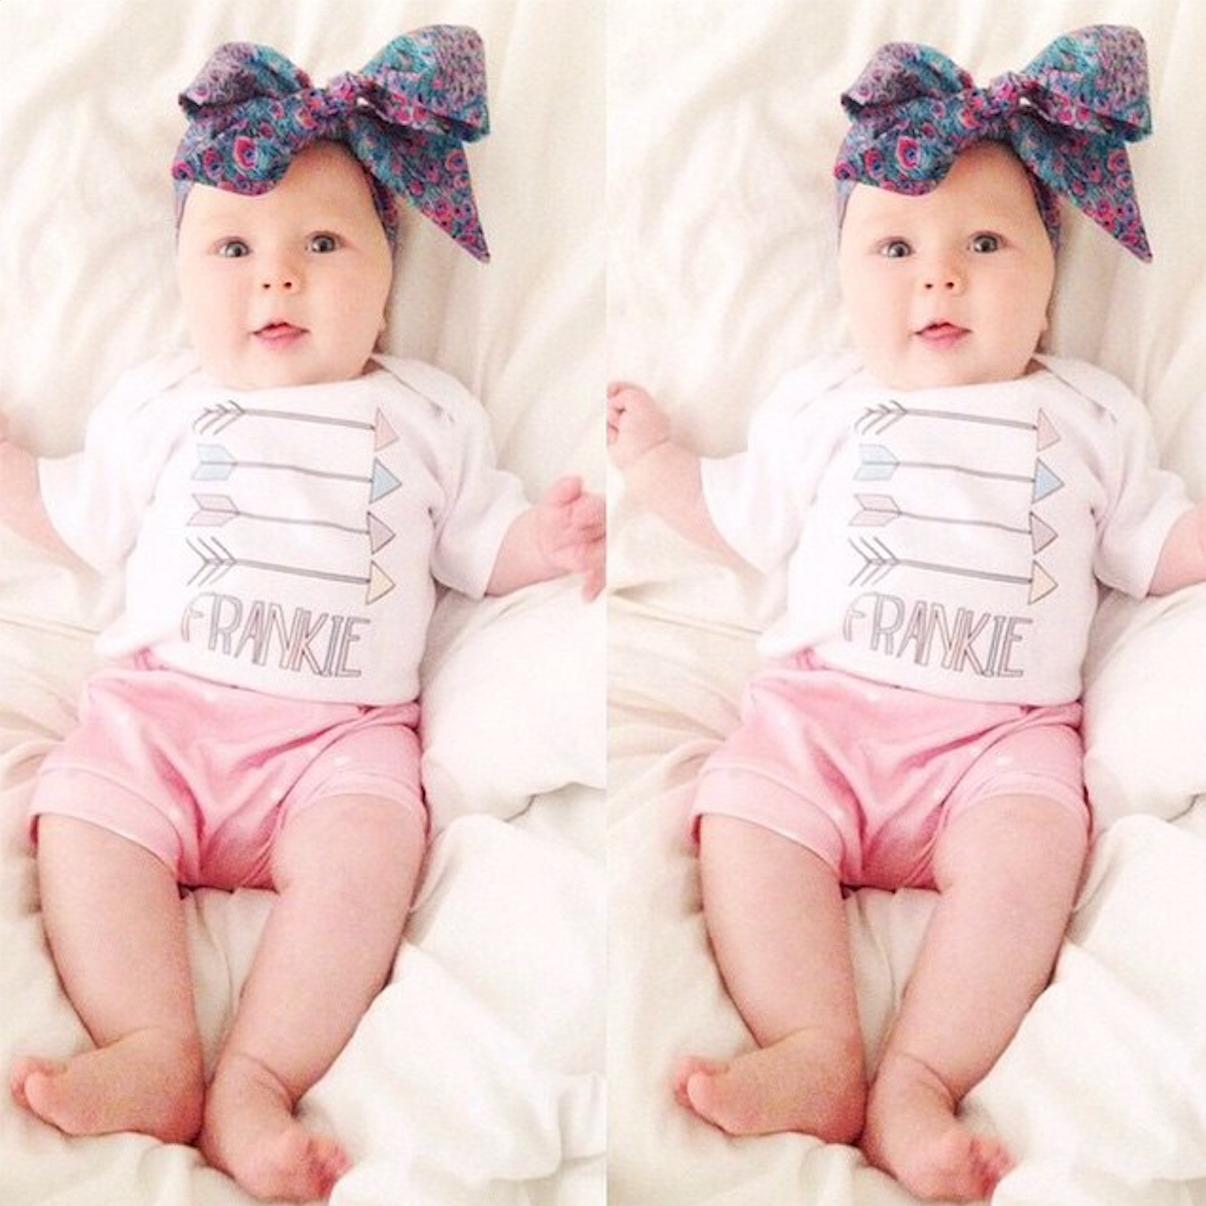 Frankie (from @frankiezara on Instagram) in our Pastel Arrows Baby Onesie